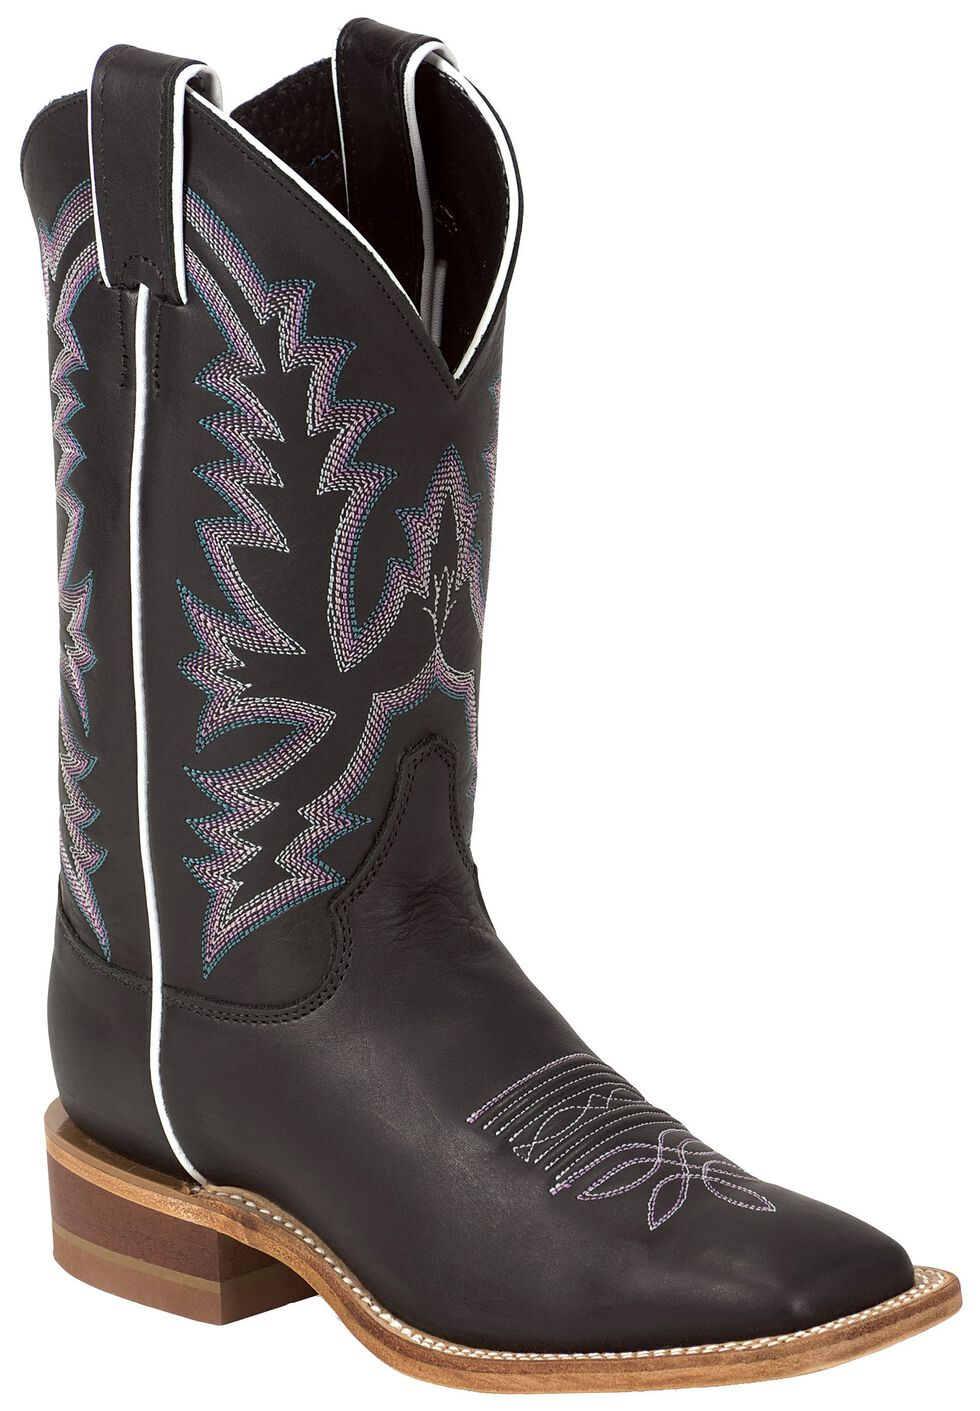 Justin Bent Rail Women's Kenedy Black Burnished Cowgirl Boots - Square Toe, Black, hi-res